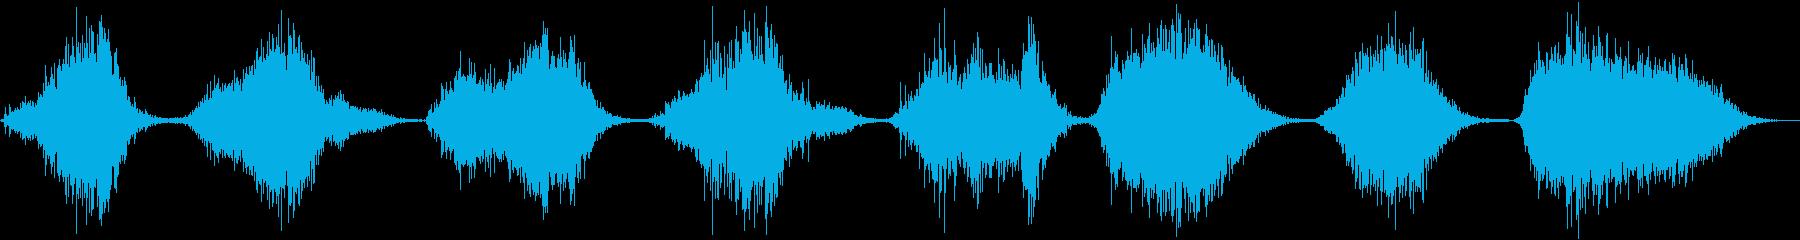 CHAOTIC MONSTER B...の再生済みの波形